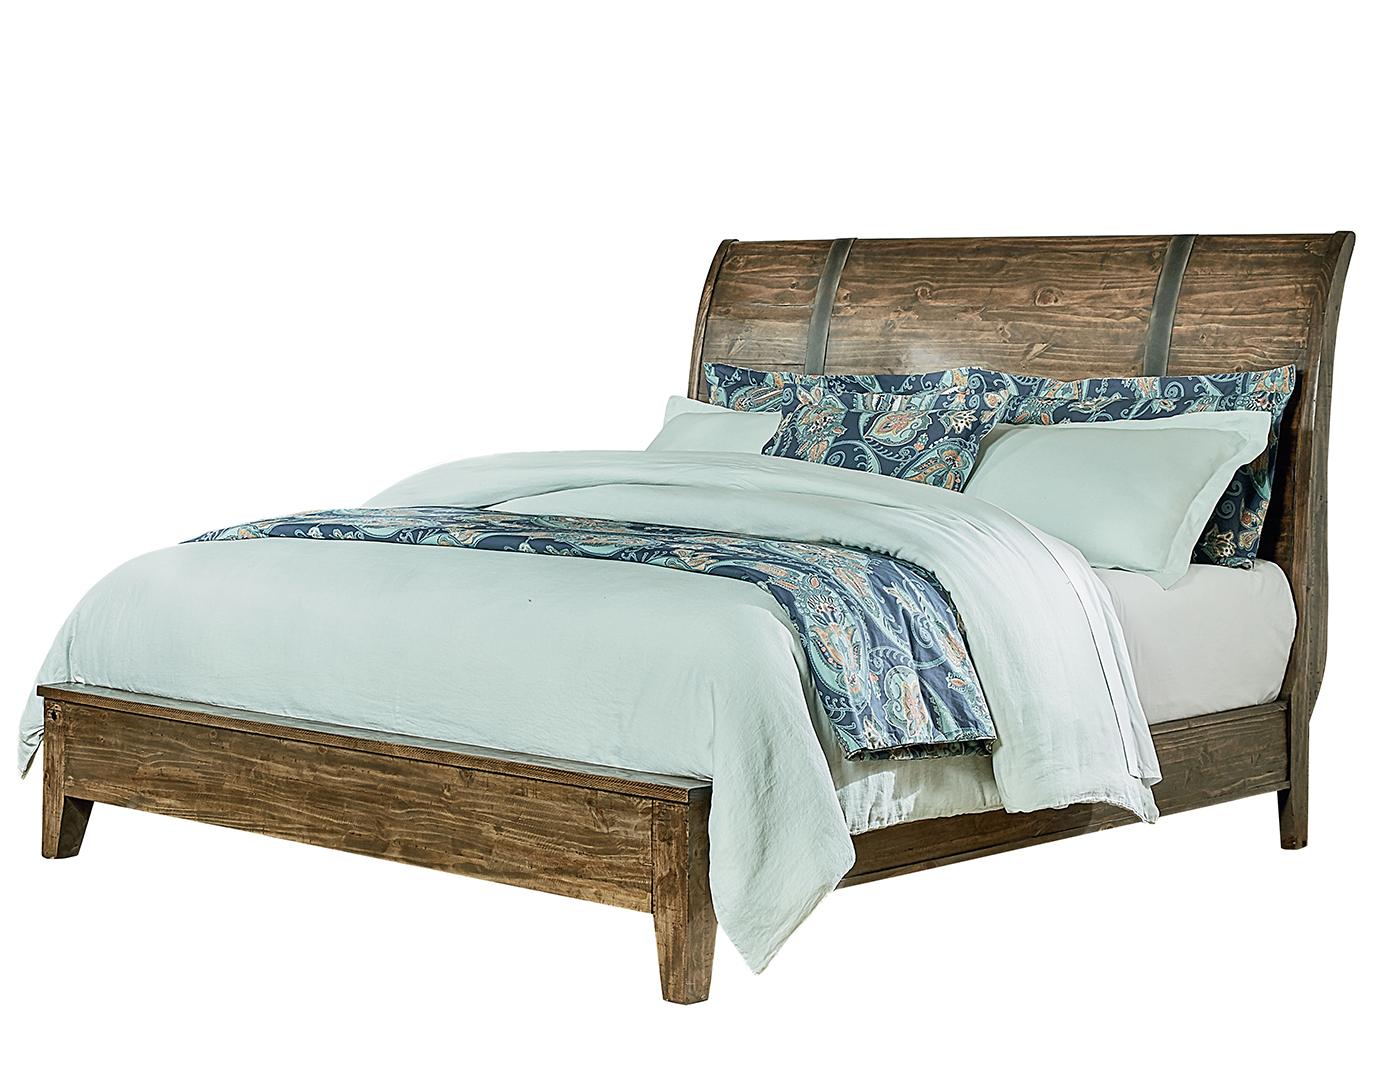 nelson queen sleigh bed - Sleigh Bed Frame Queen